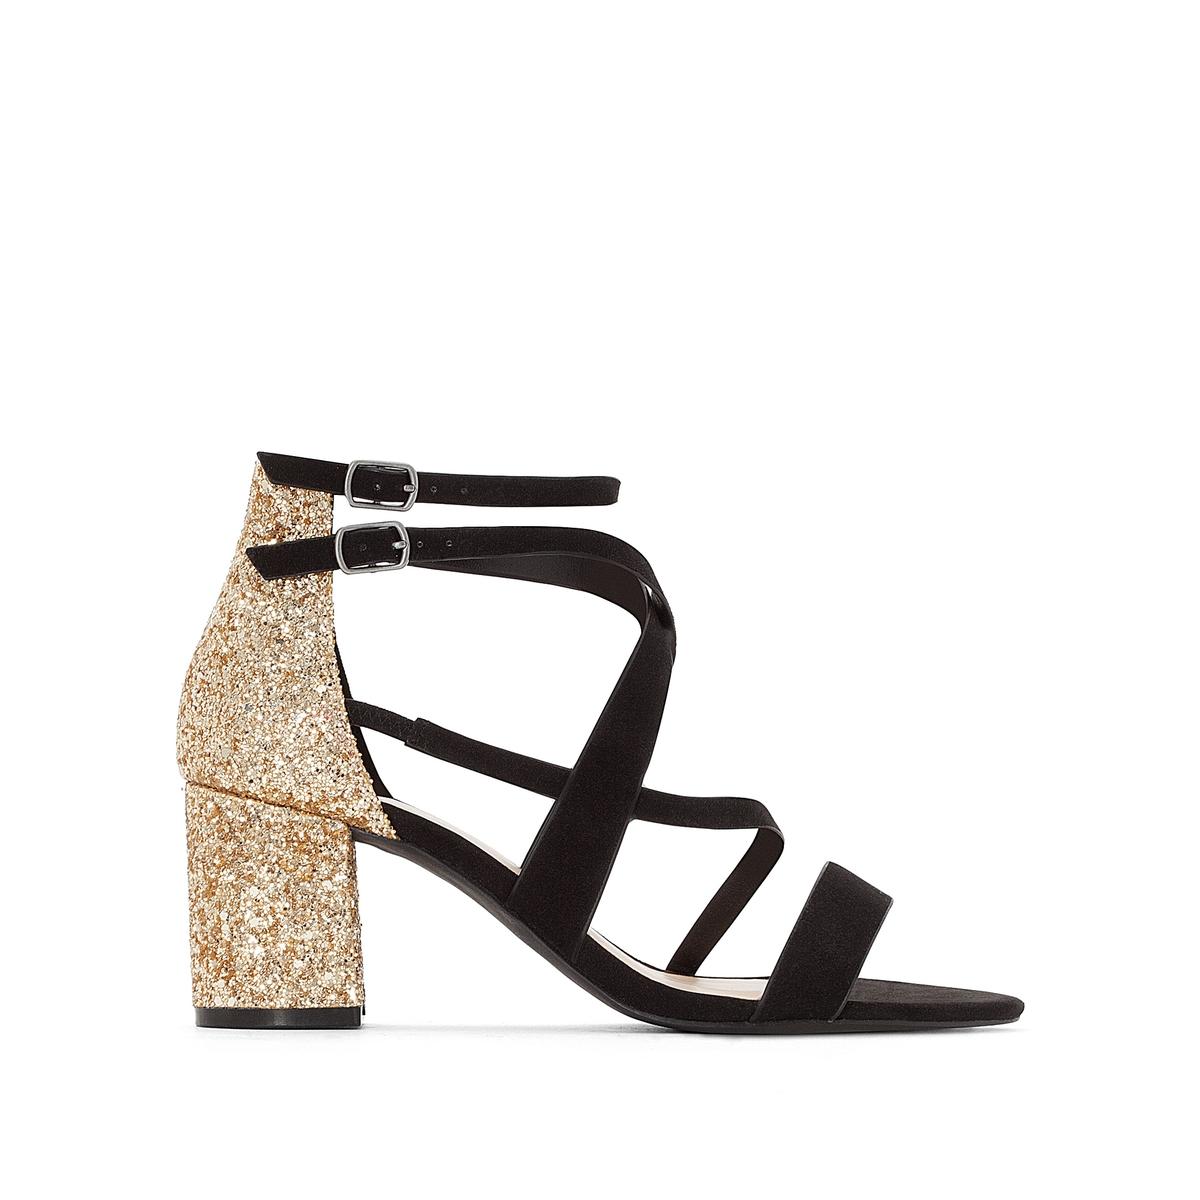 Босоножки на каблуке с блестками цены онлайн